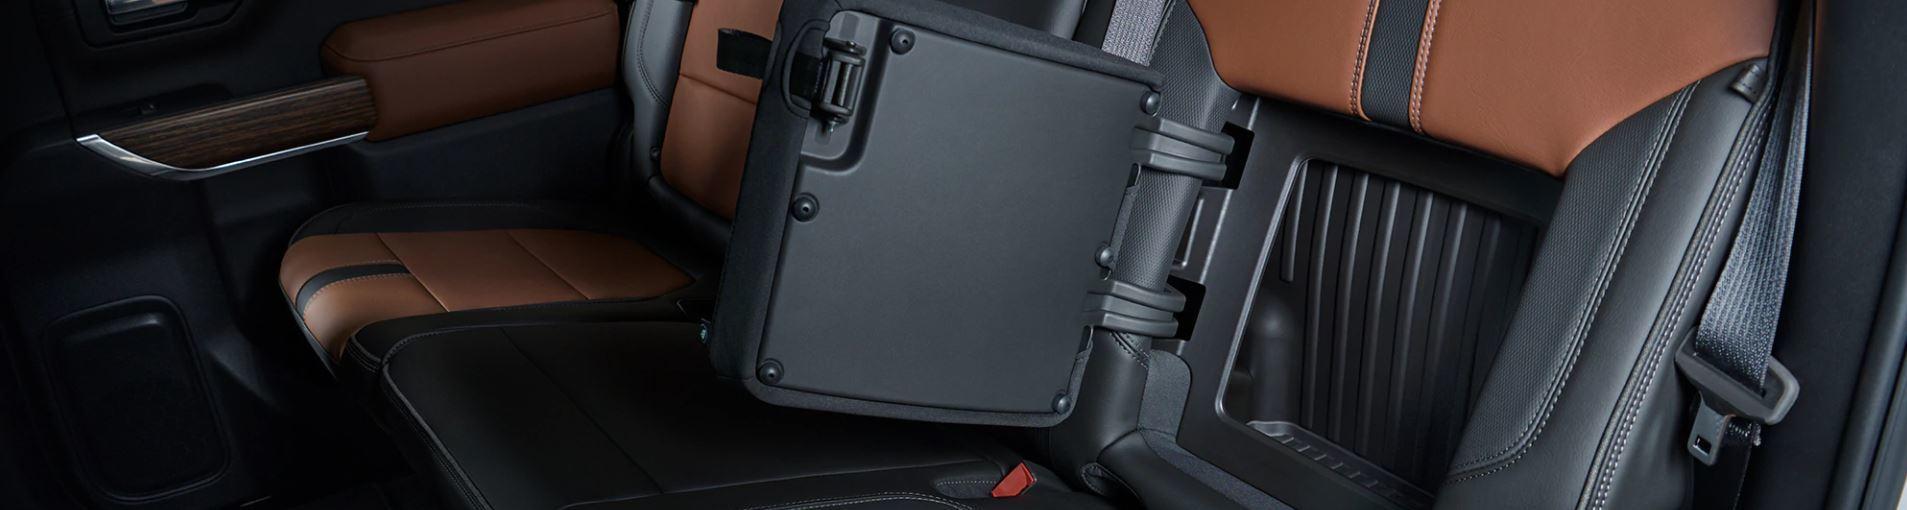 2019 Chevrolet Silverado 1500 In-seat Storage